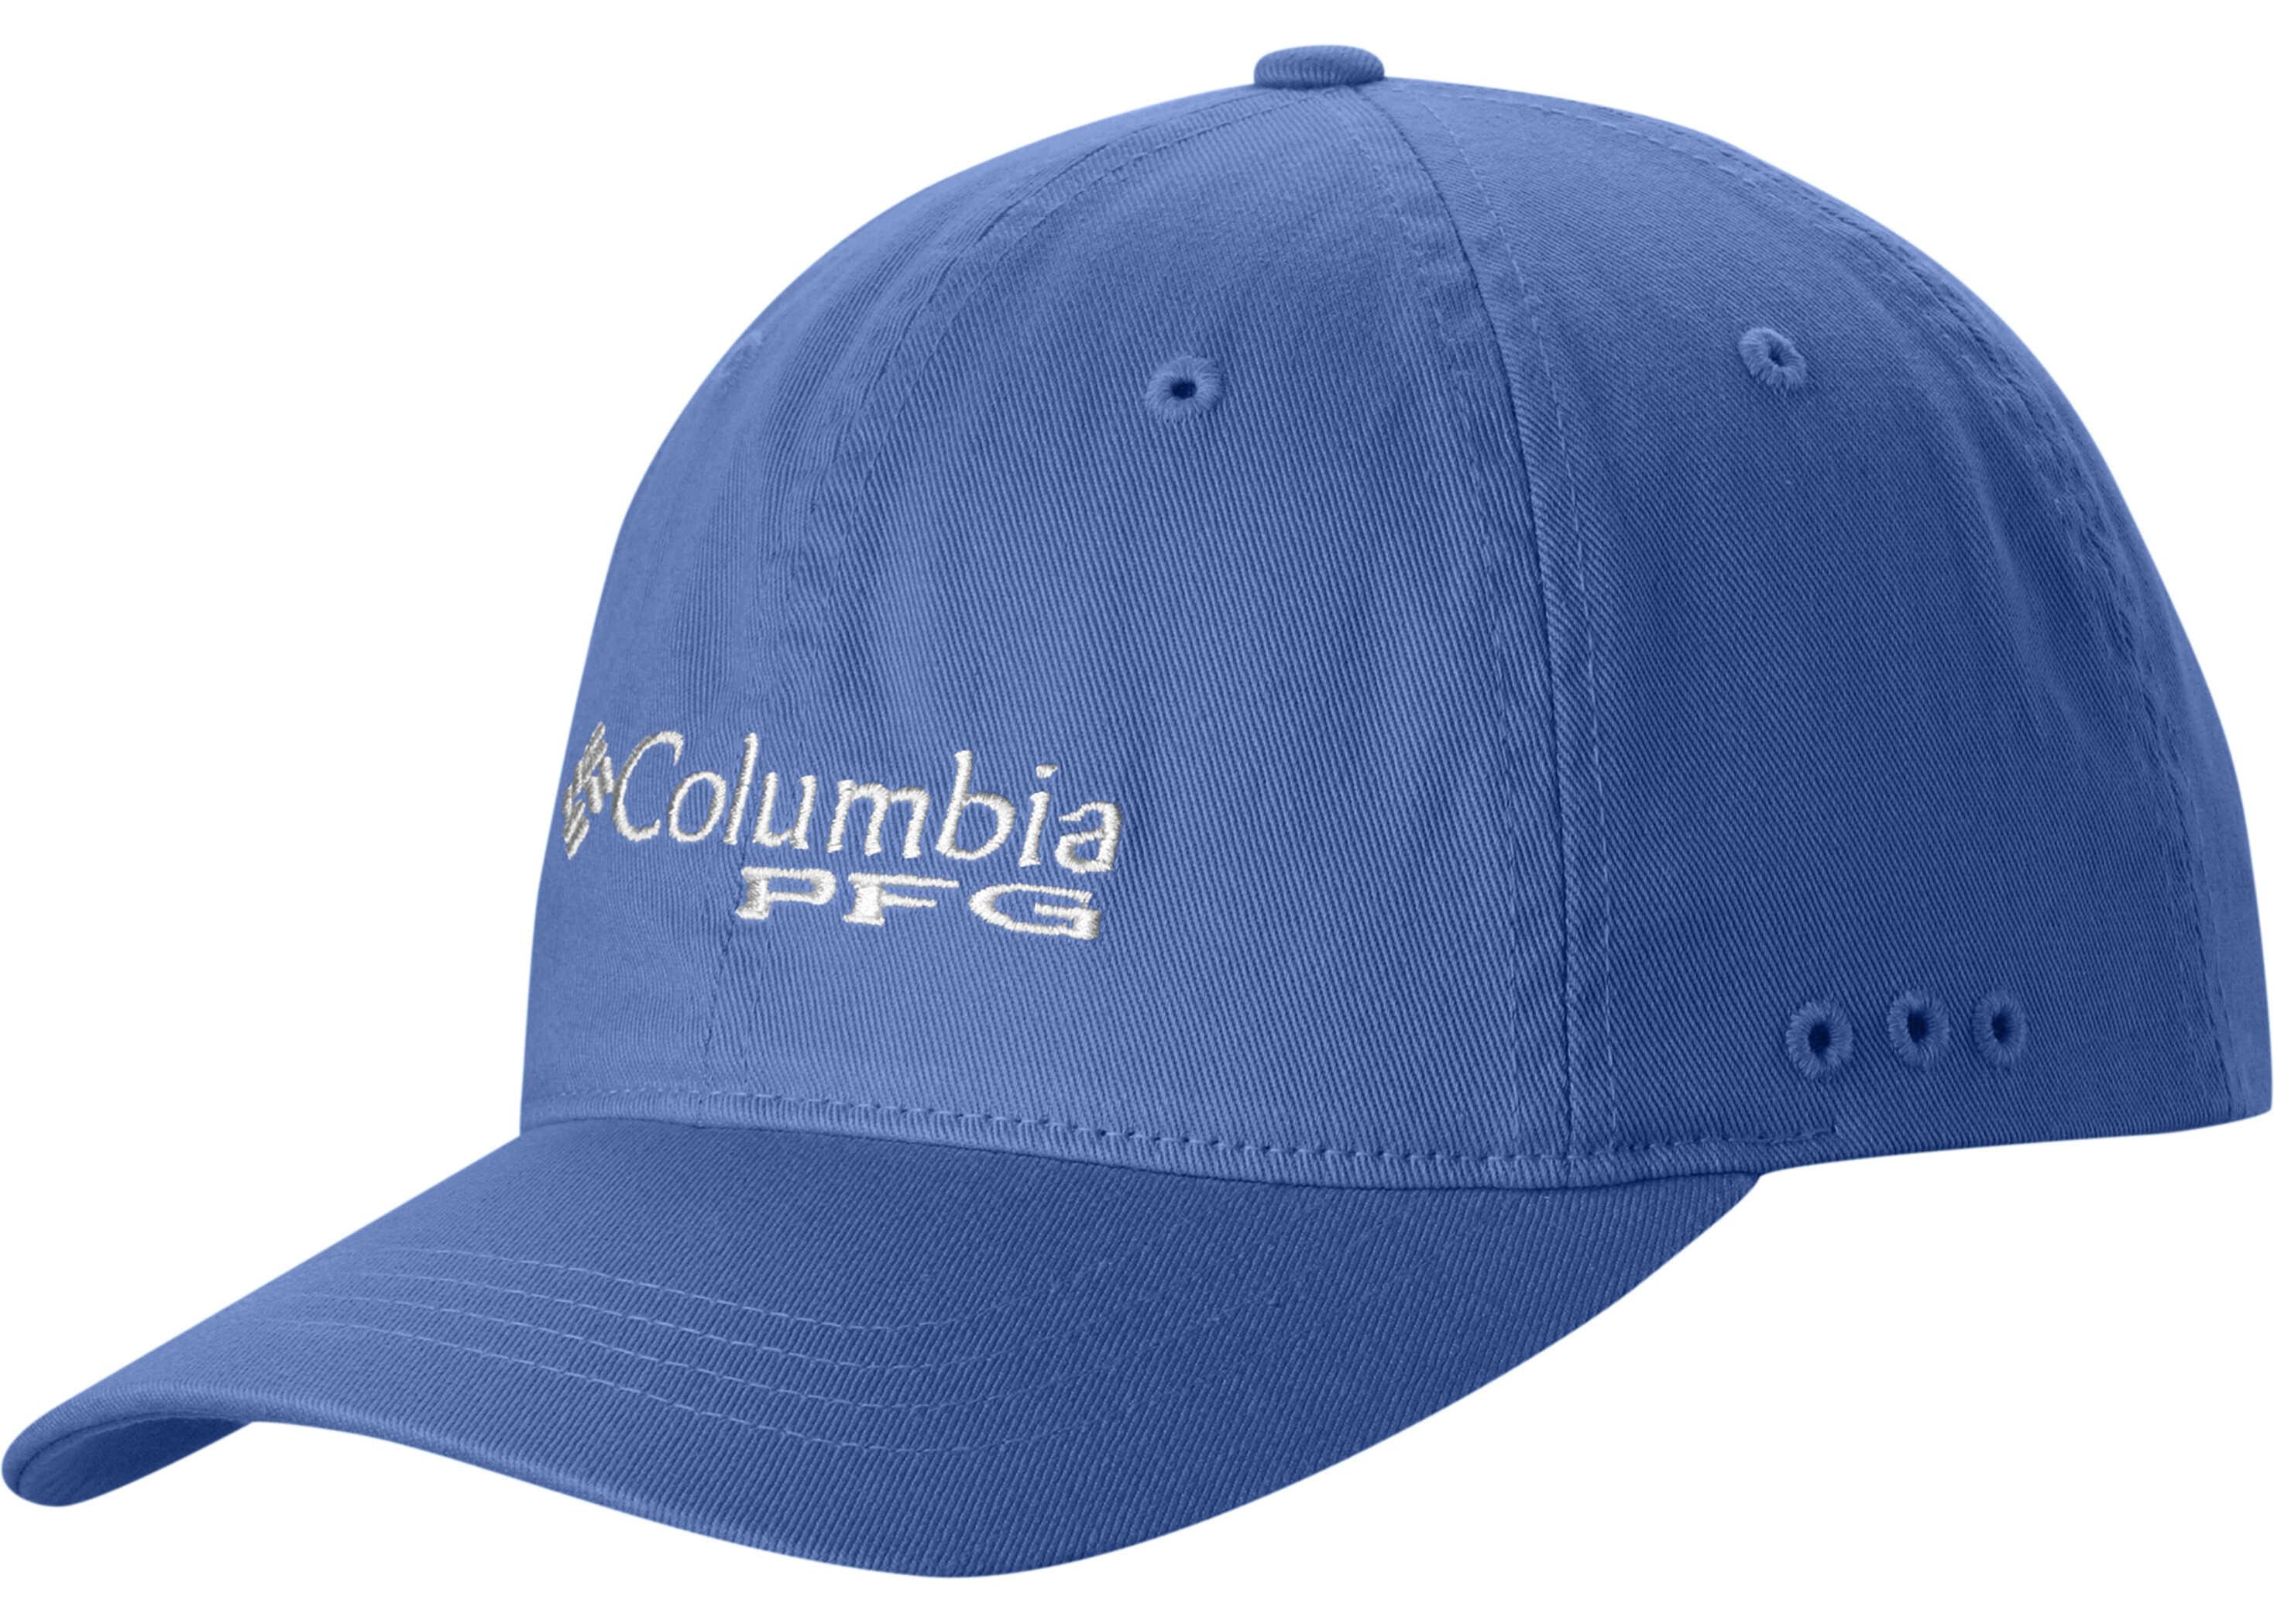 Columbia PFG Bonehead ™ Ballcap-Jude Lime Vivid Blue, White